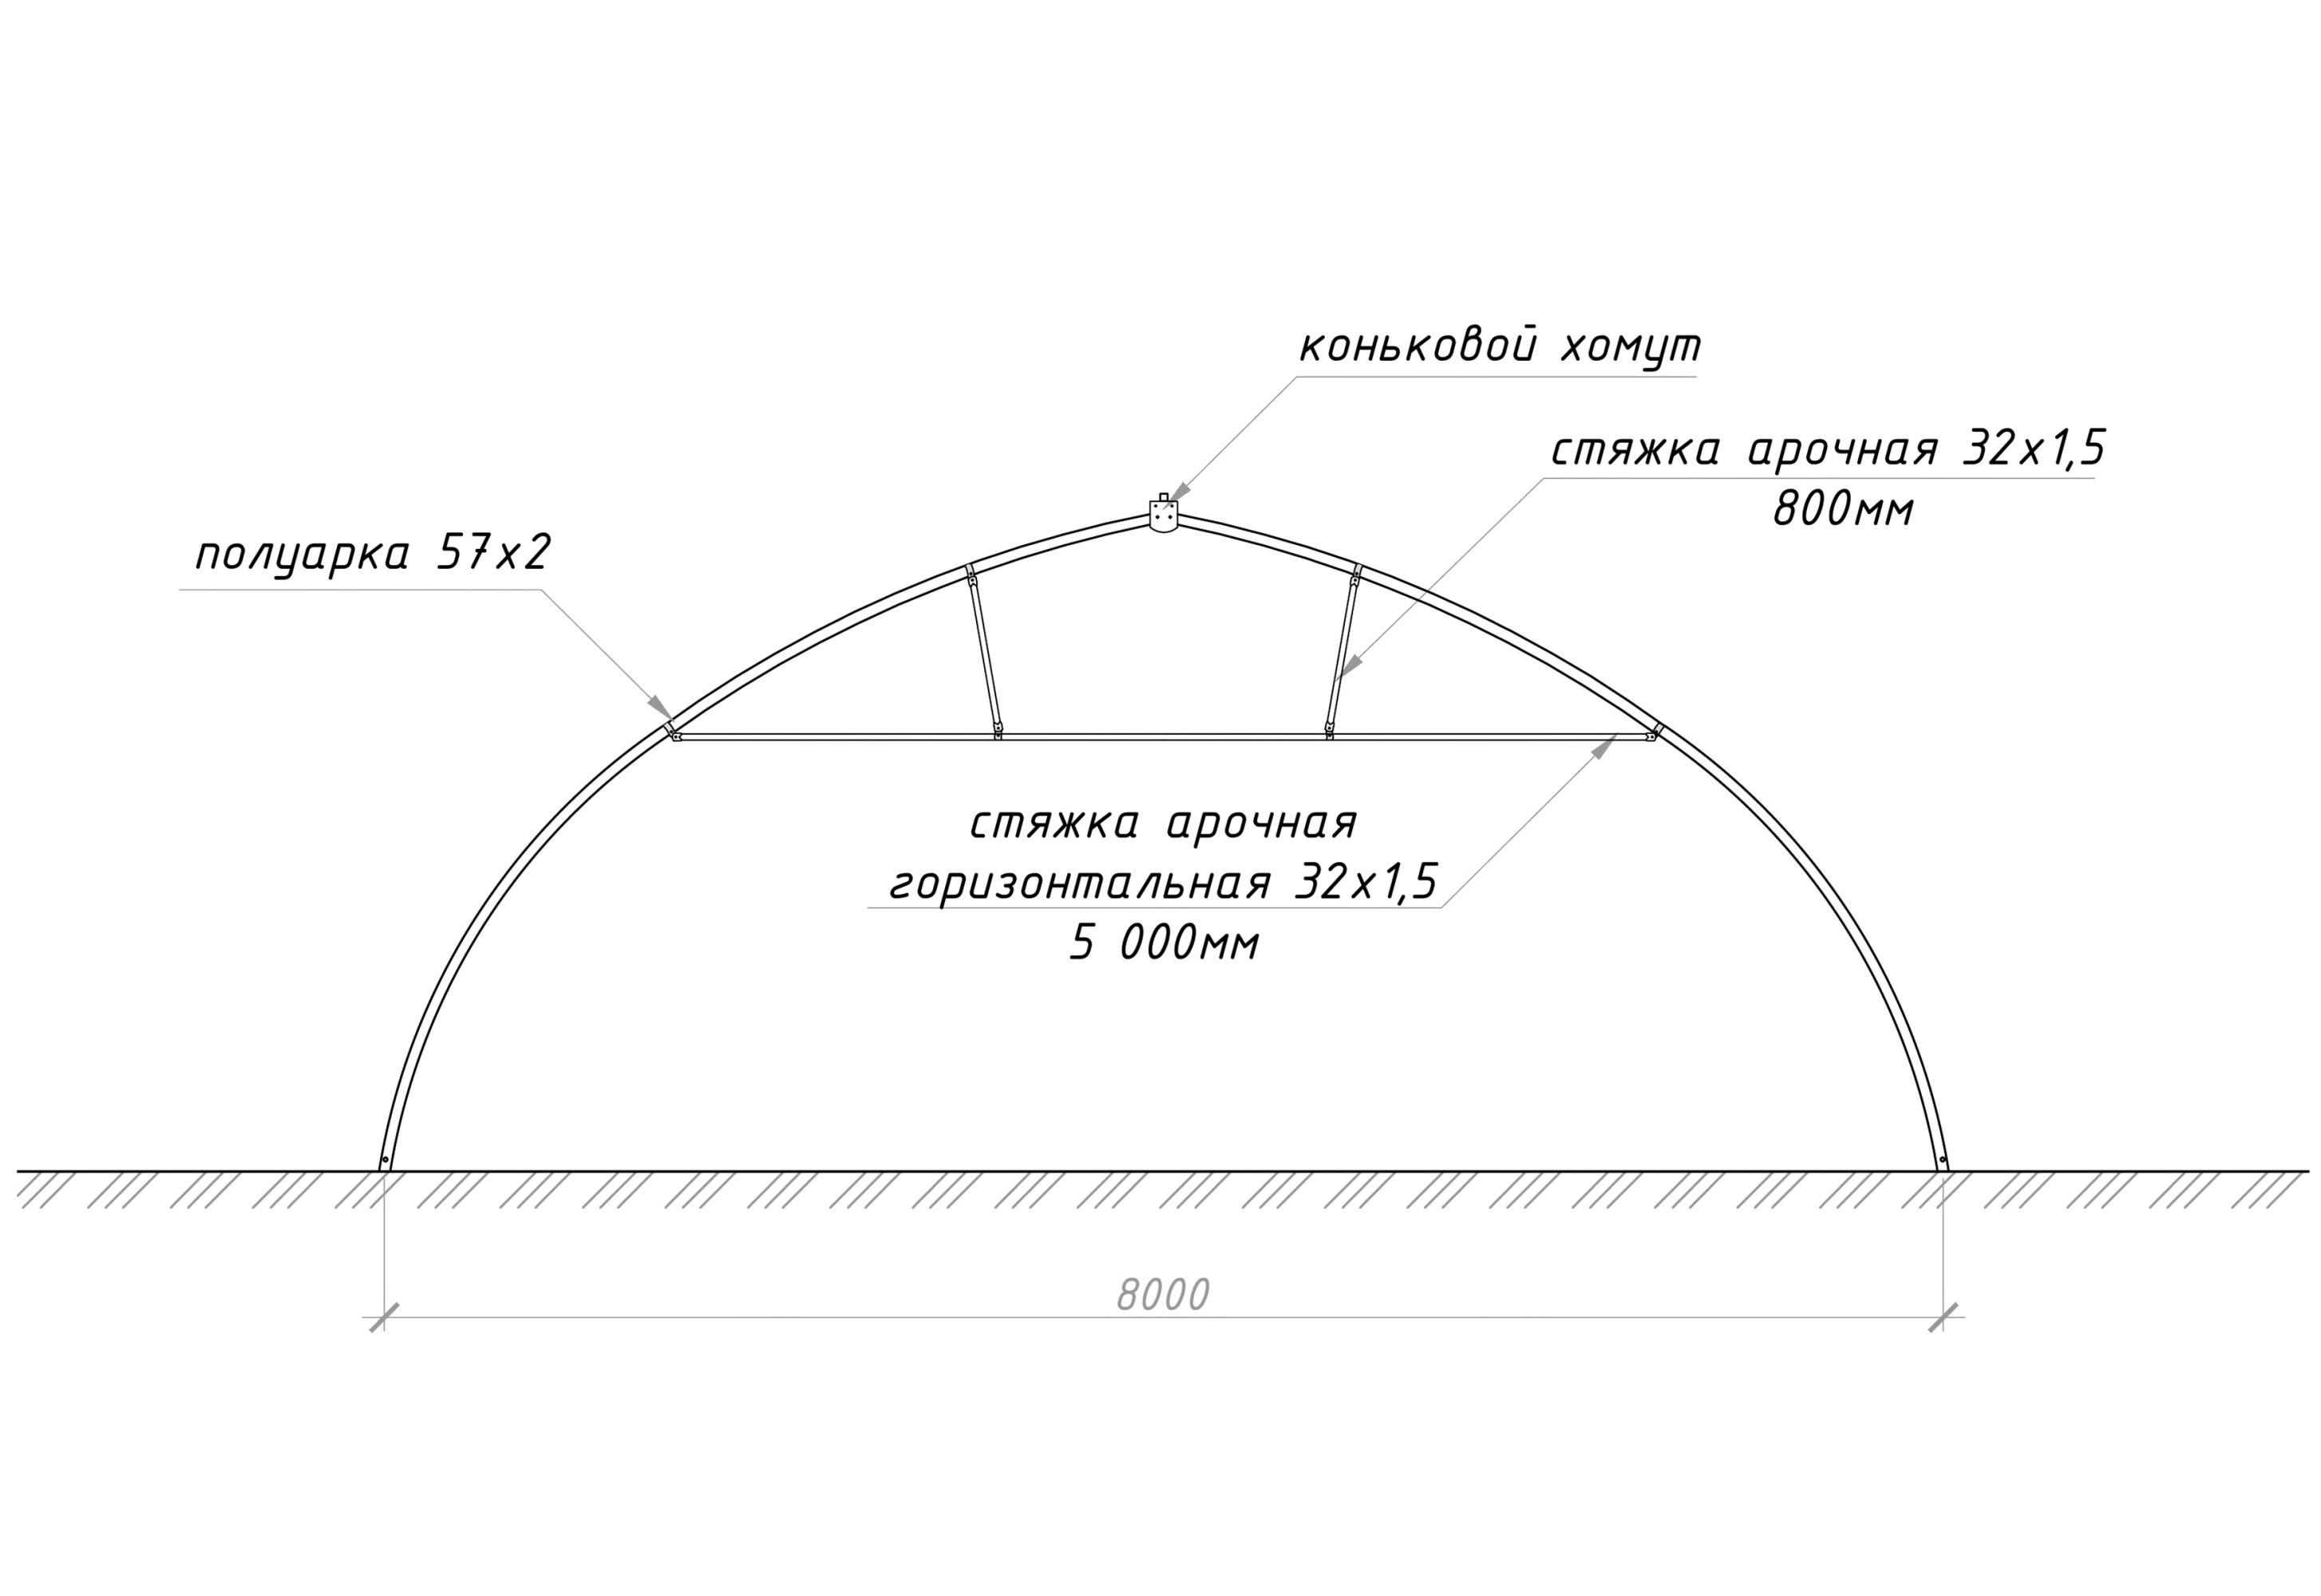 Фермерская арочная теплица 8м